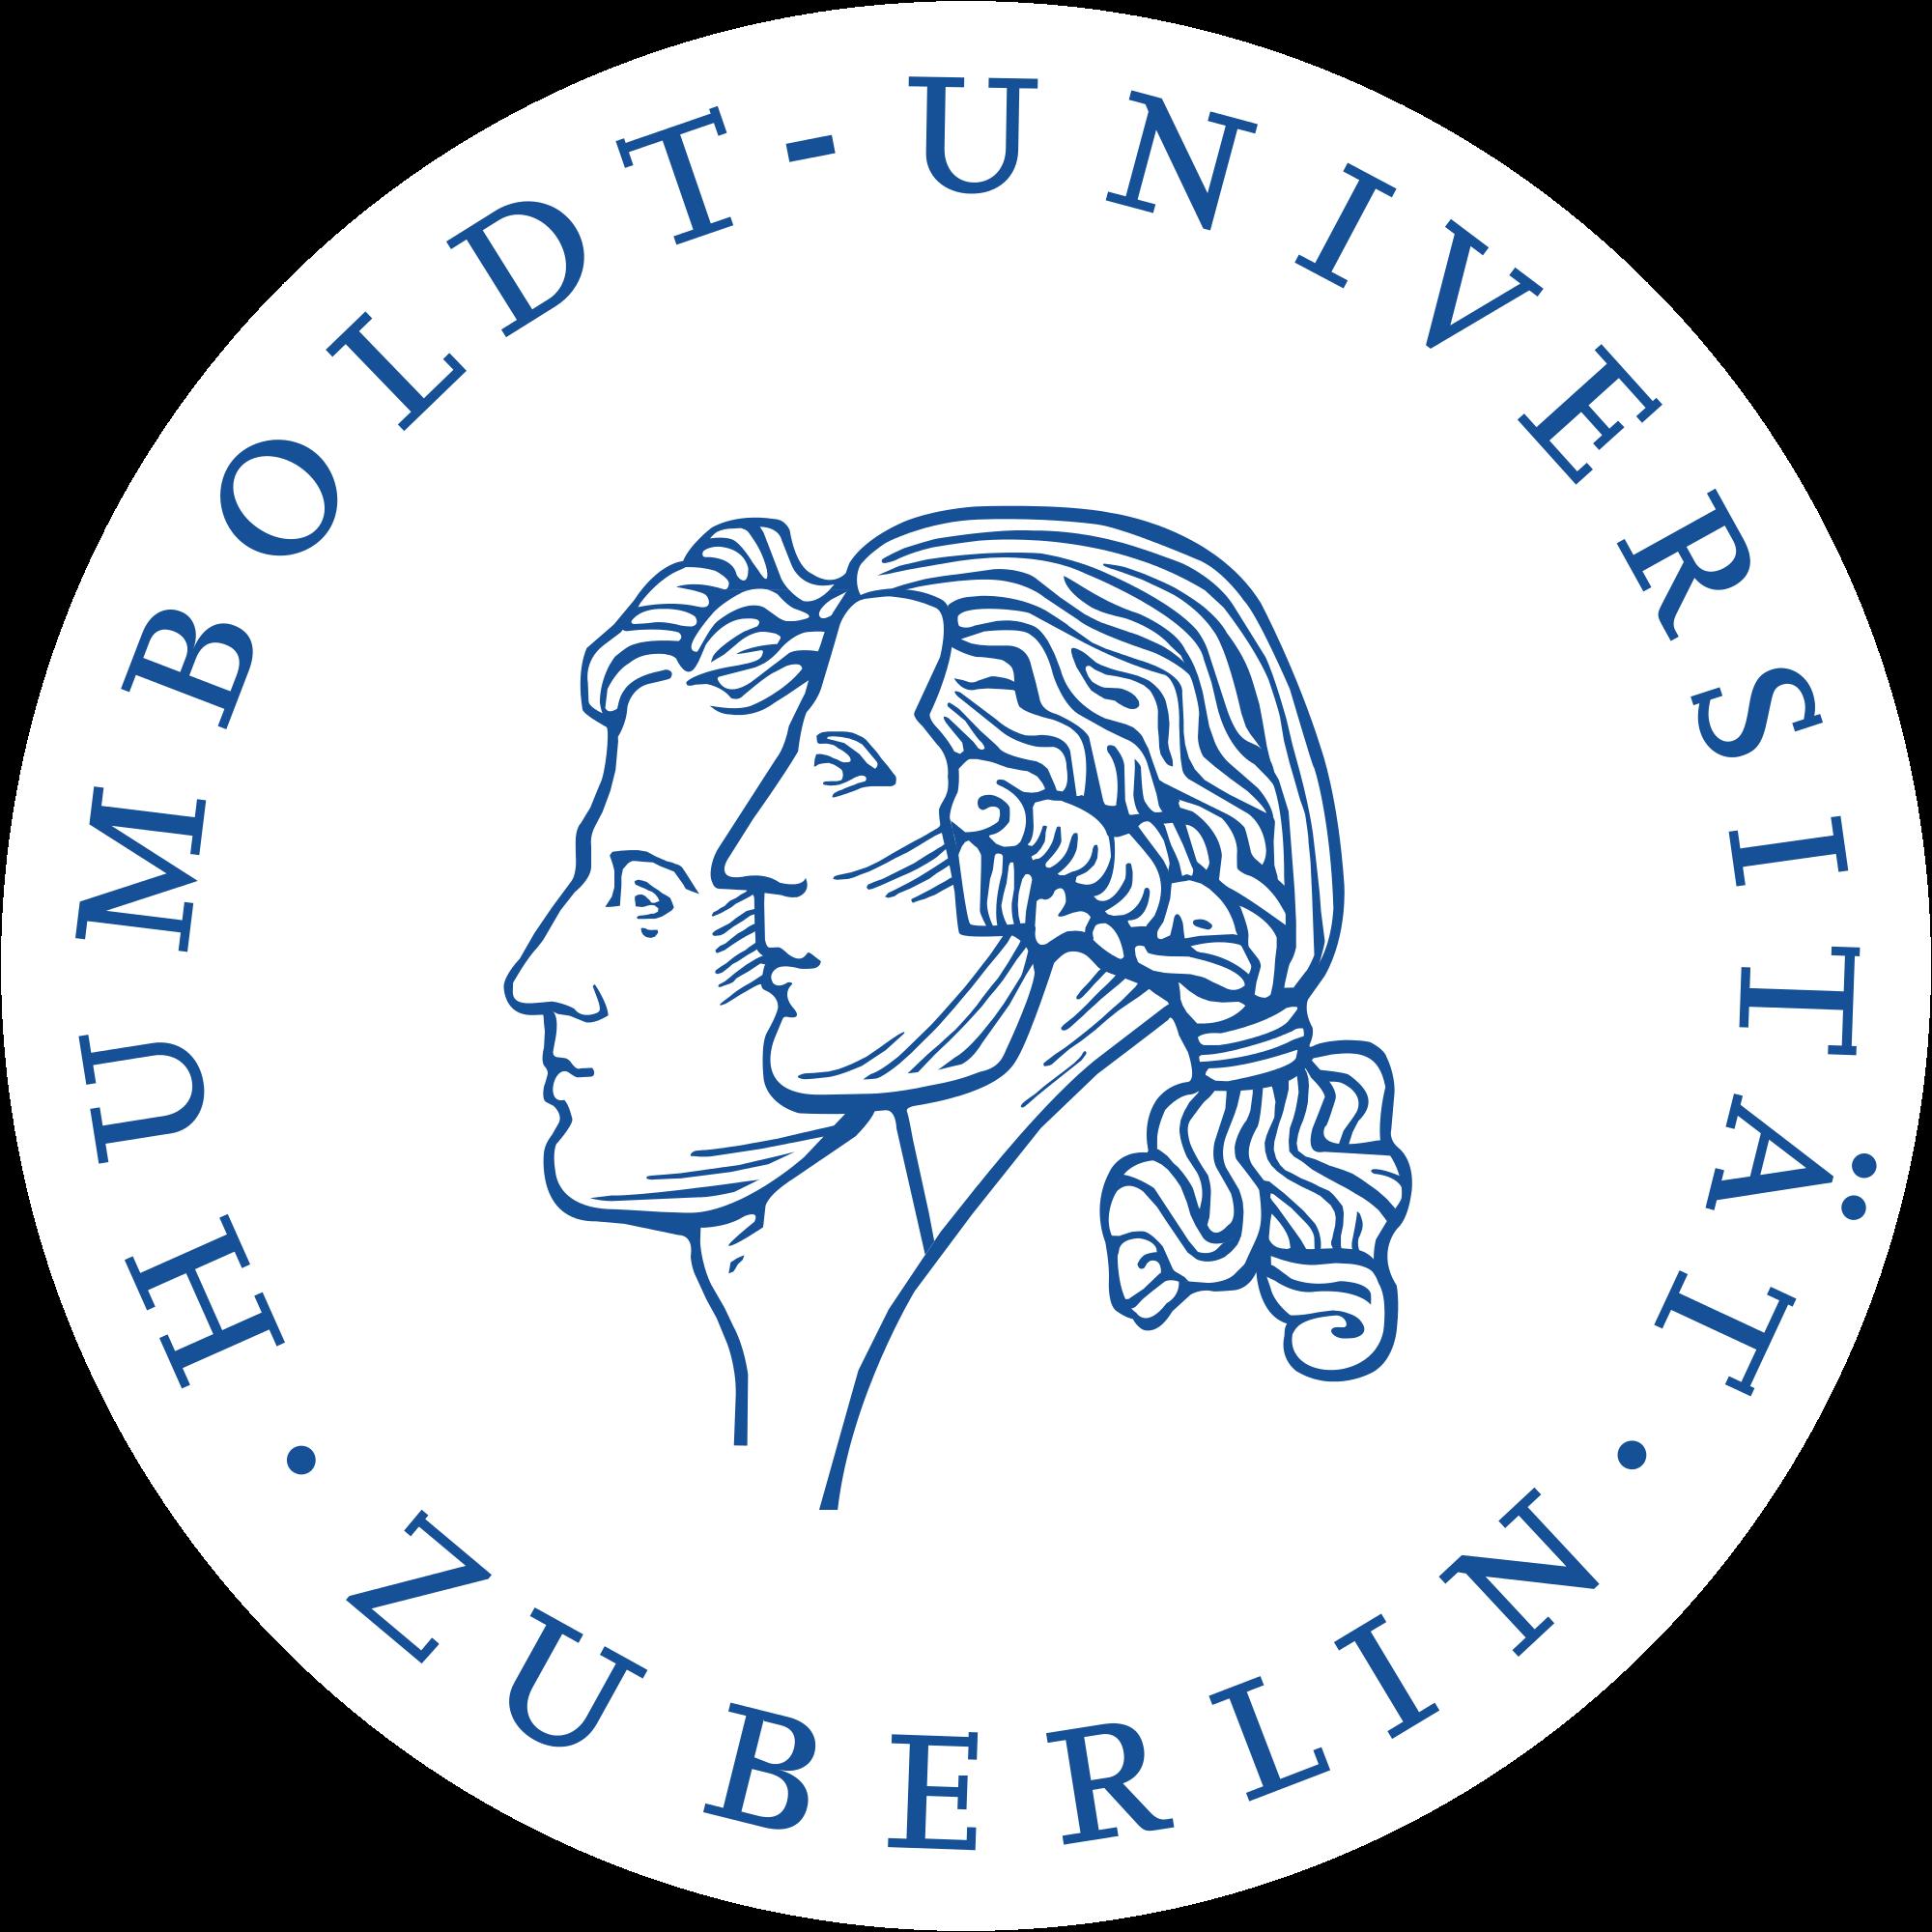 MC Sem 1 SoSe 17 MSM 2.0 an der Humboldt-Universität zu Berlin